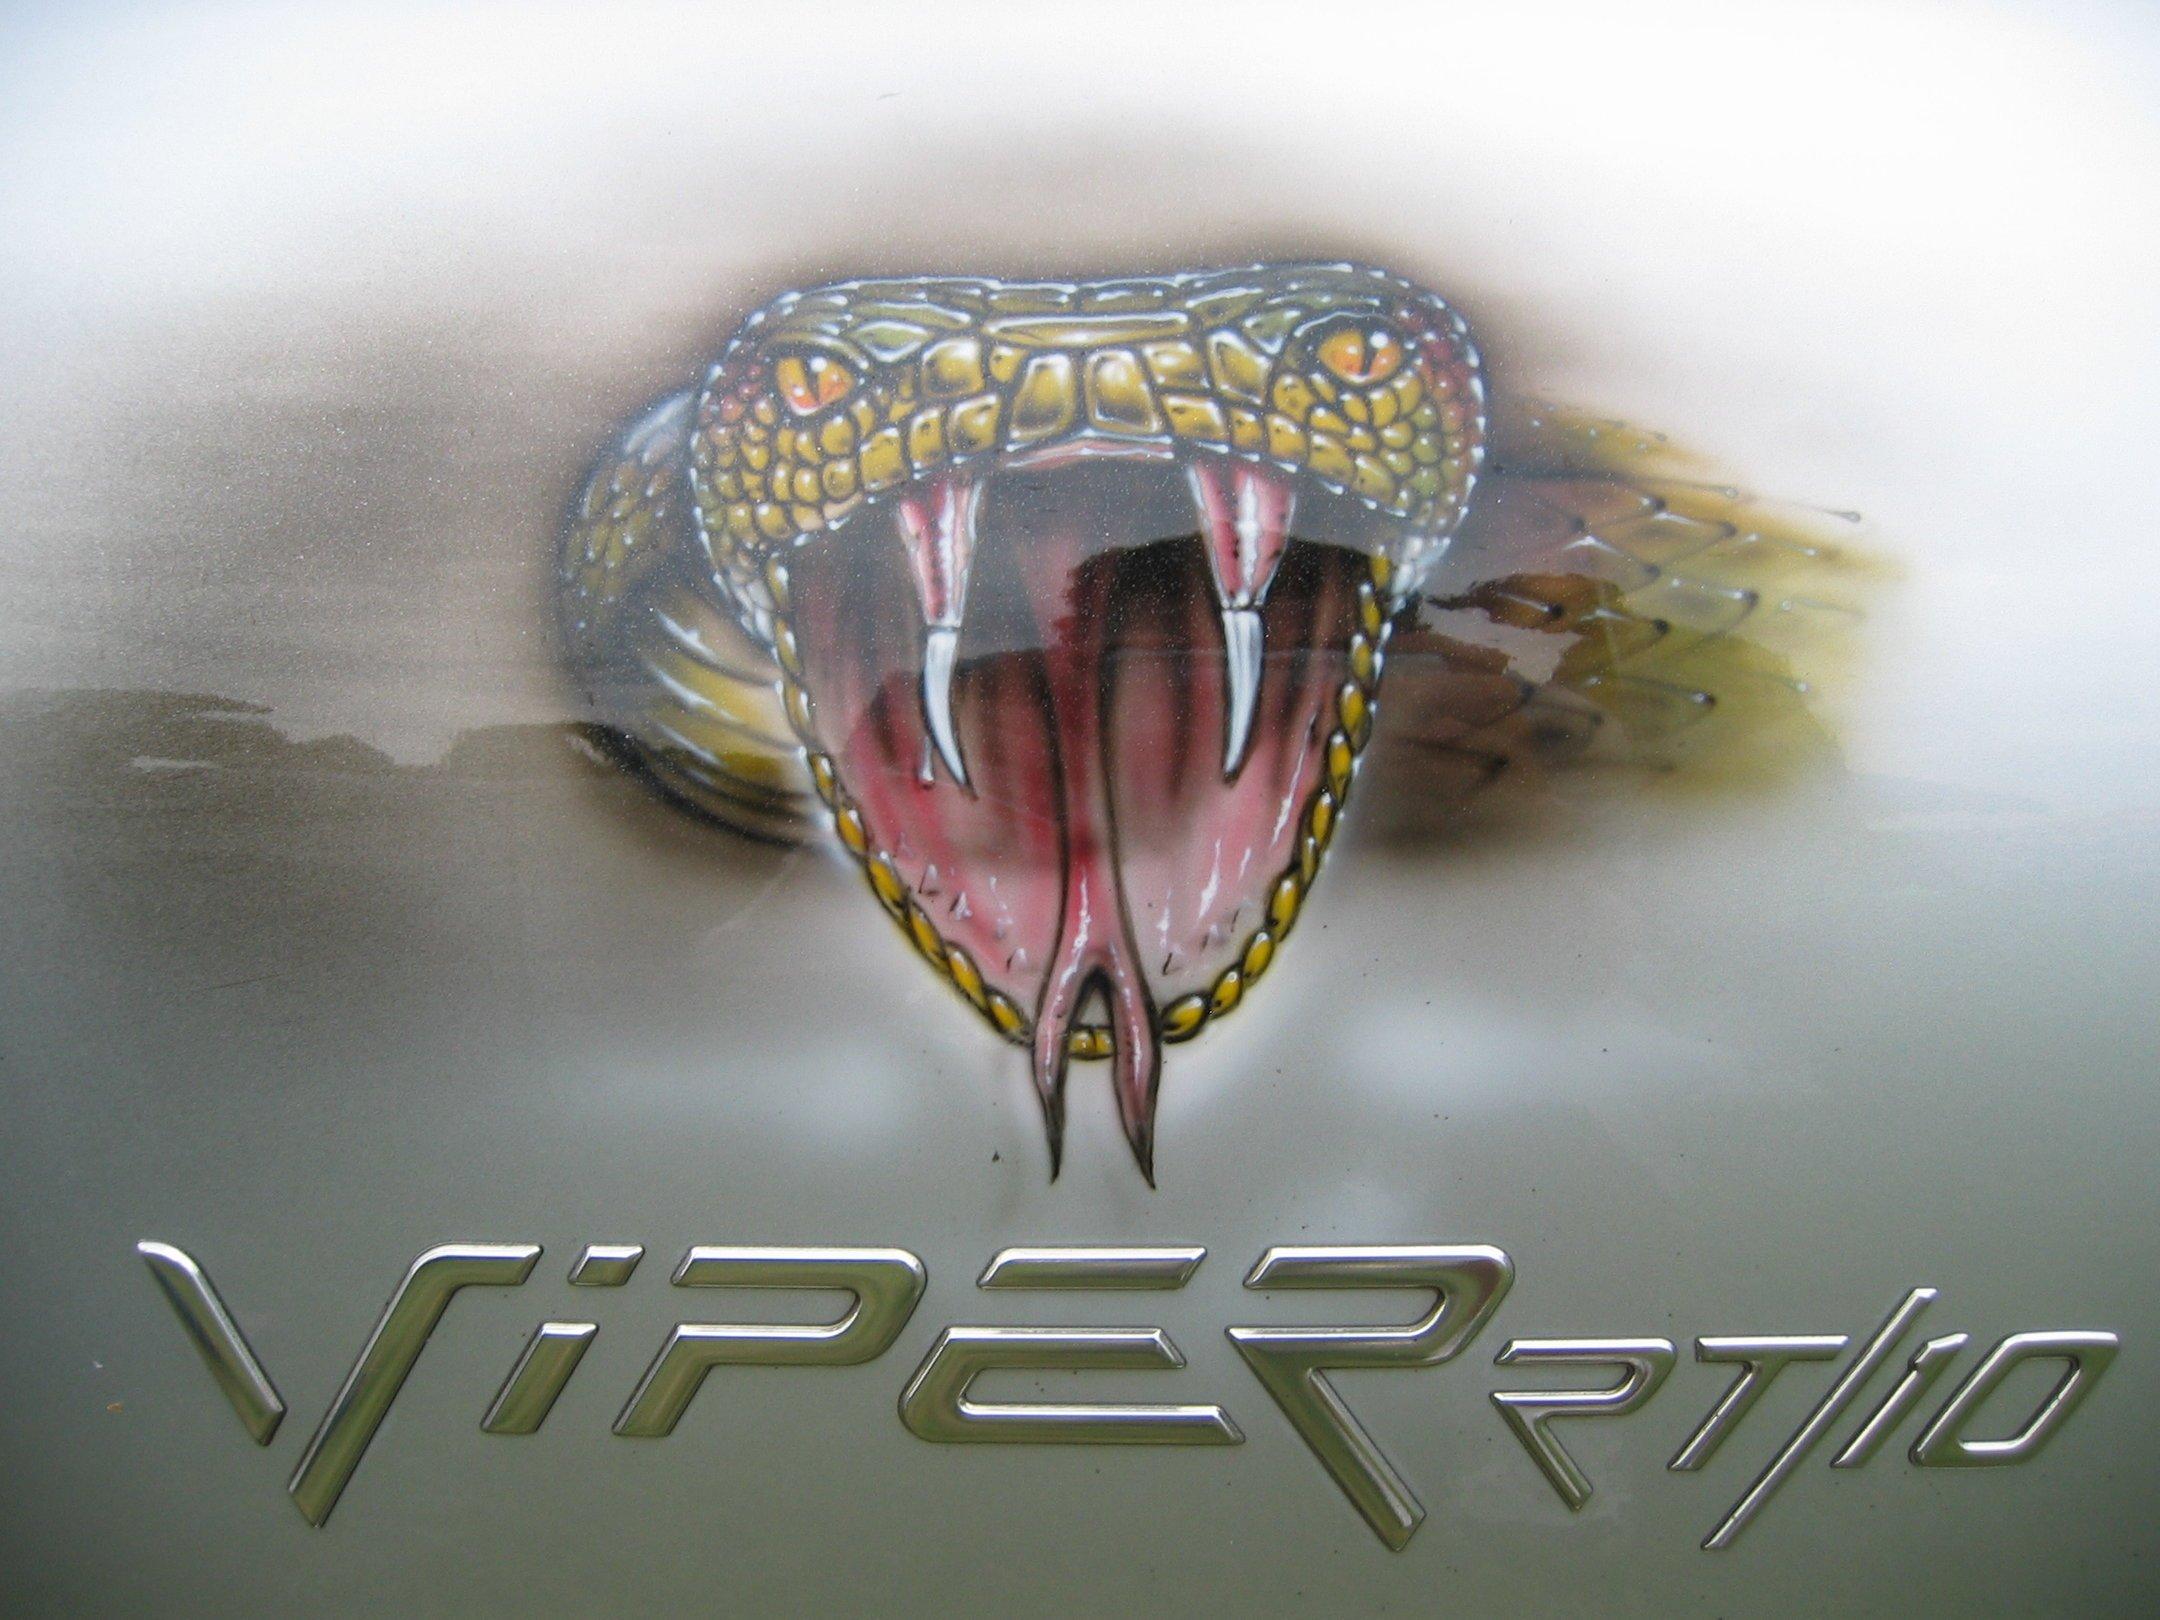 47 Dodge Viper Logo Wallpaper On Wallpapersafari